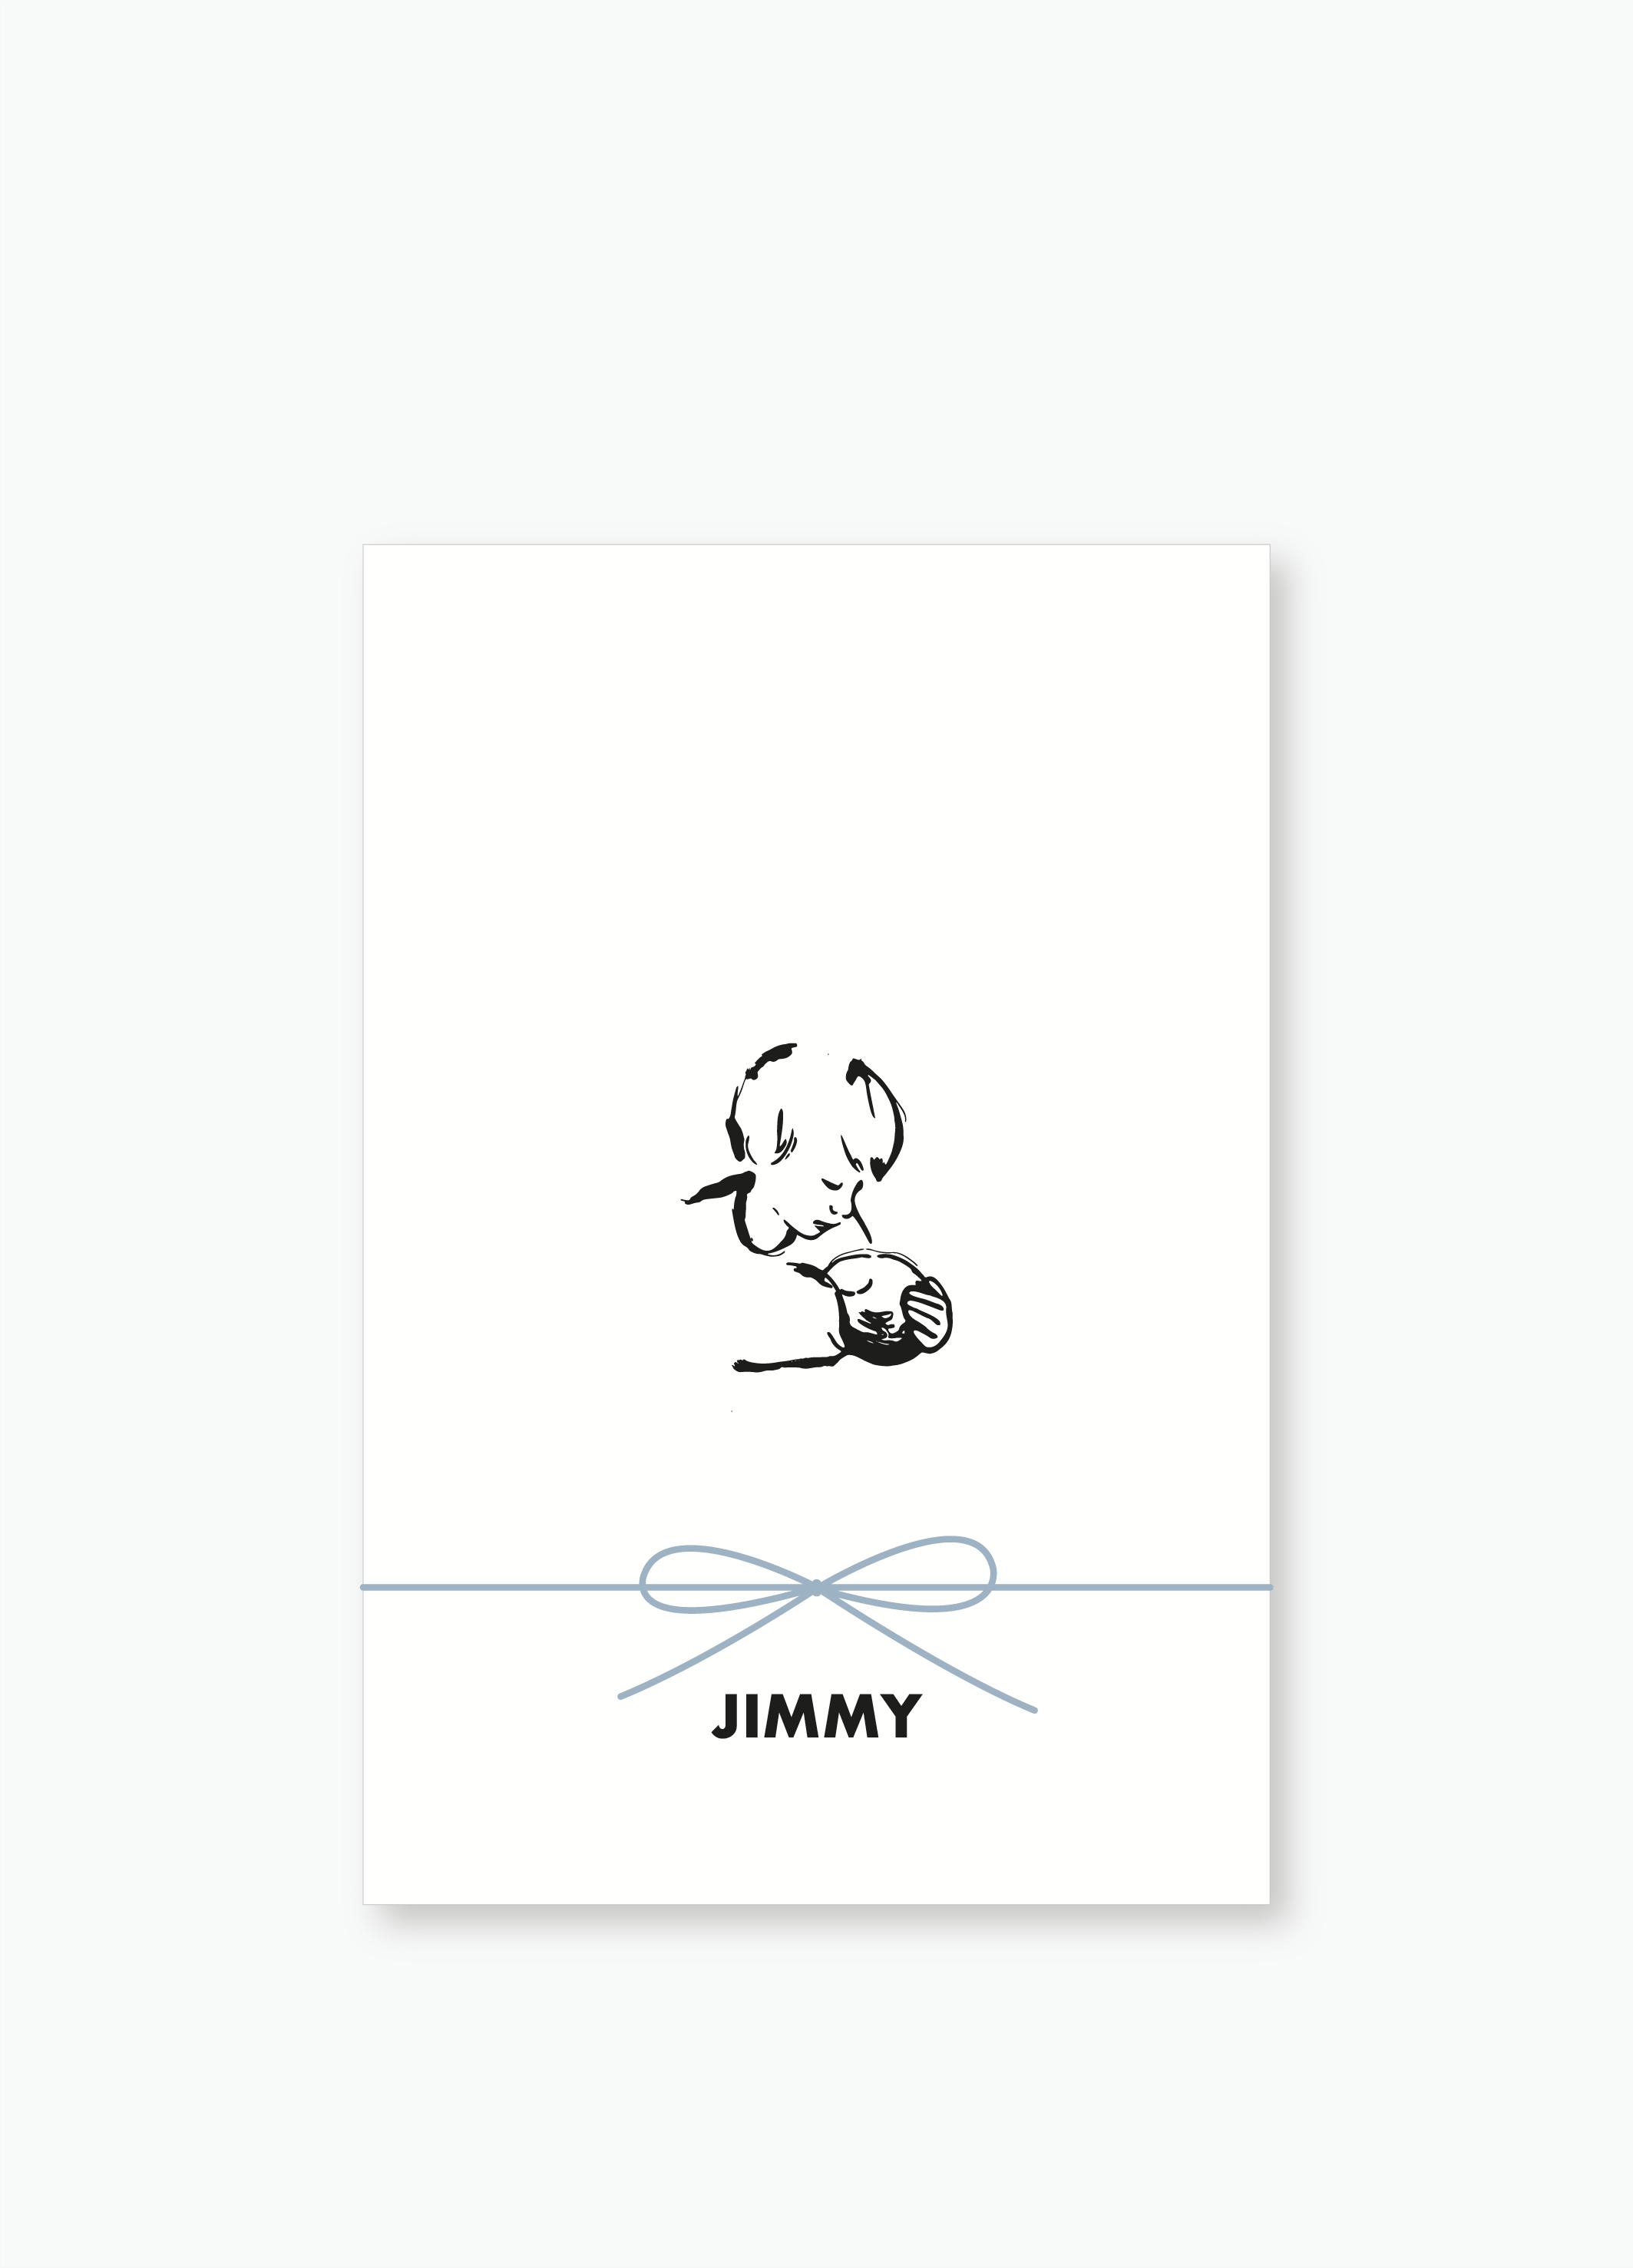 Geboortekaartje Jimmy | Studio Moose